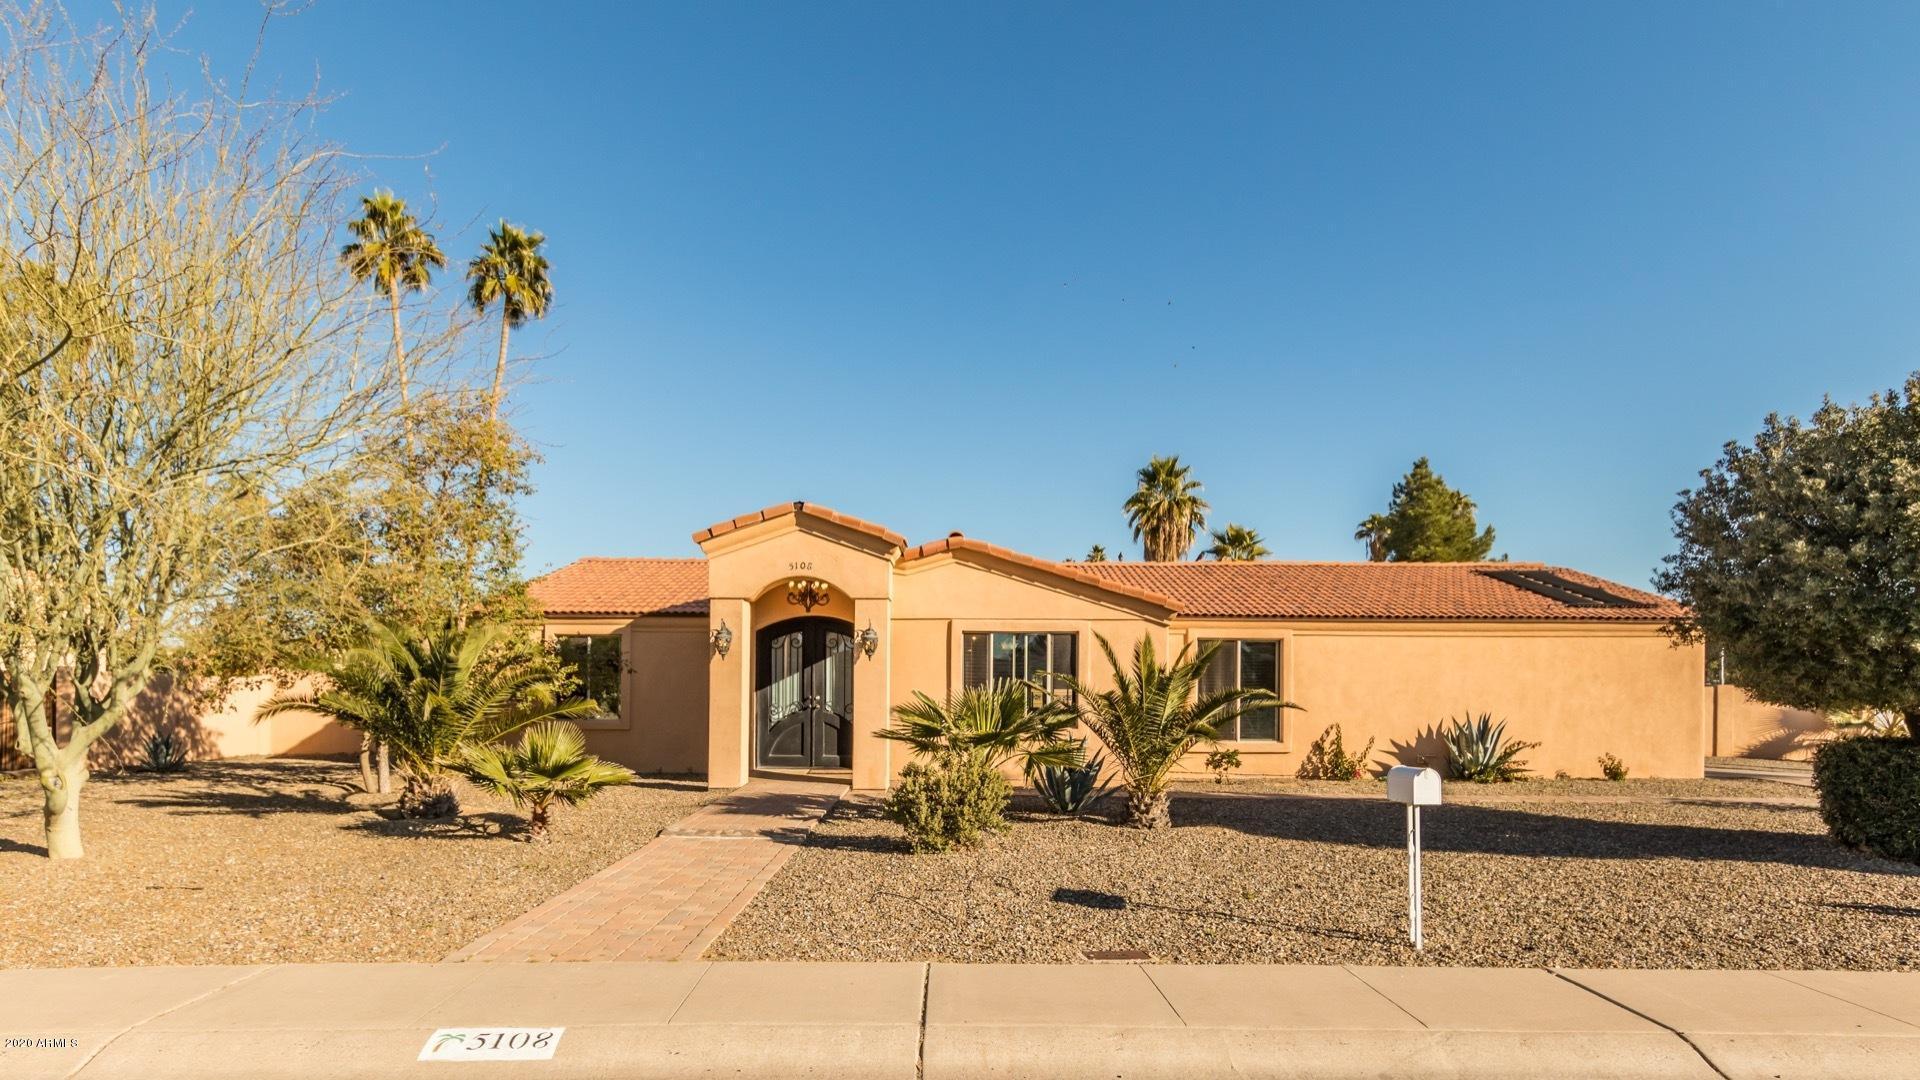 Photo of 5108 E WETHERSFIELD Road, Scottsdale, AZ 85254